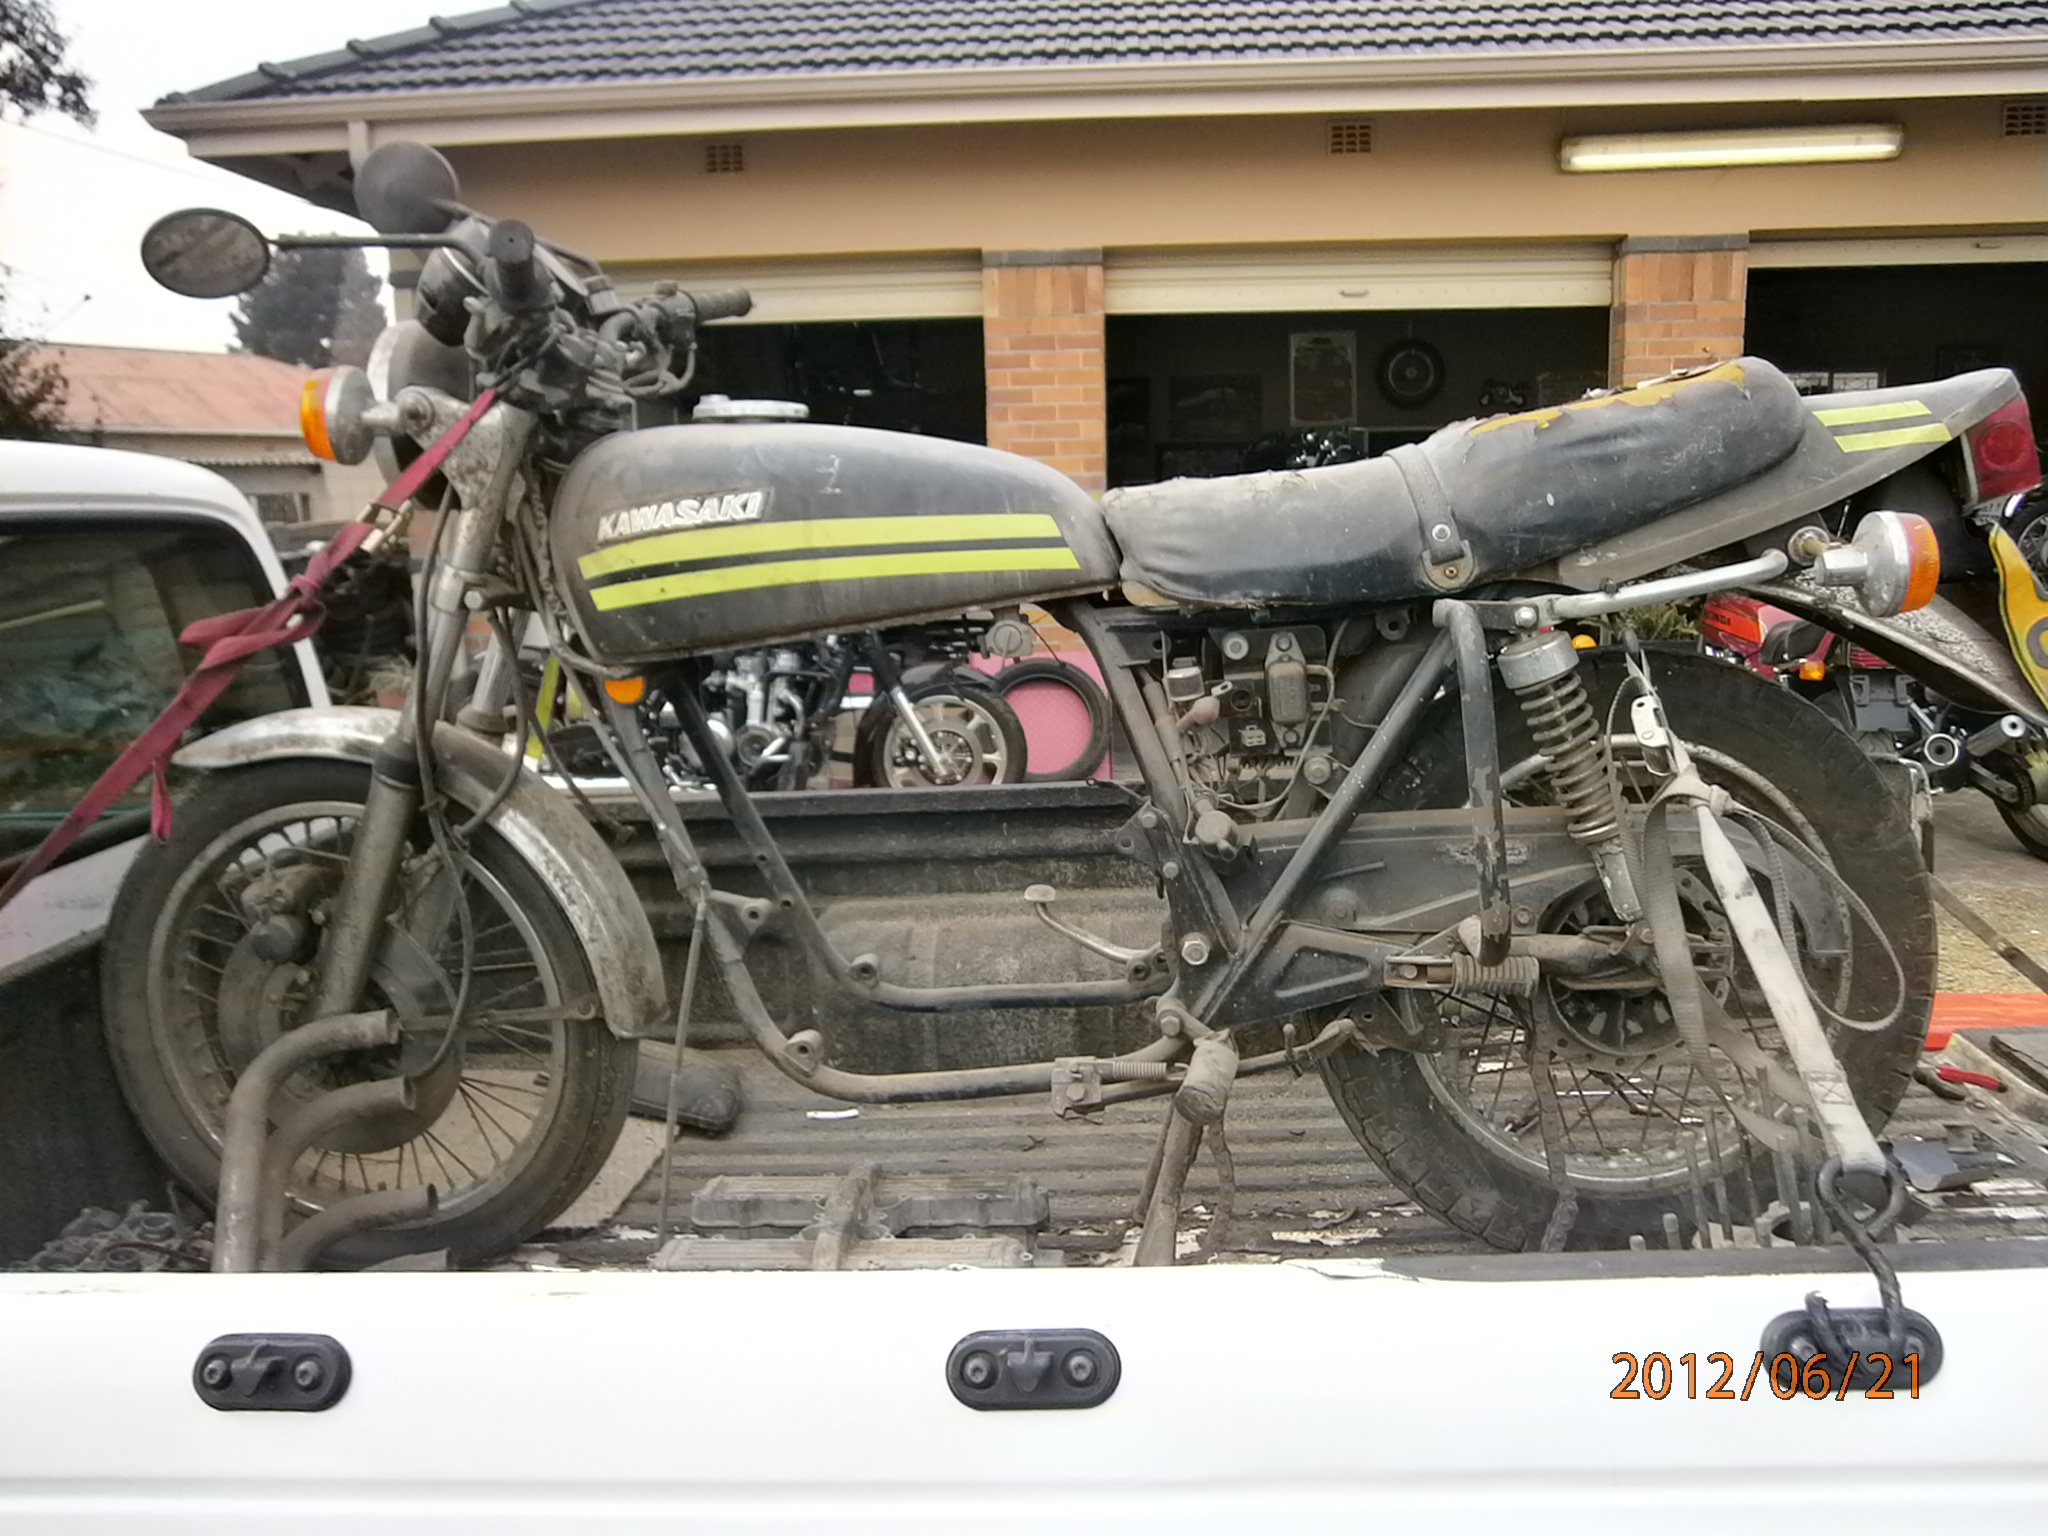 1976 Kawasaki KZ 650 cafe racer before pic 1